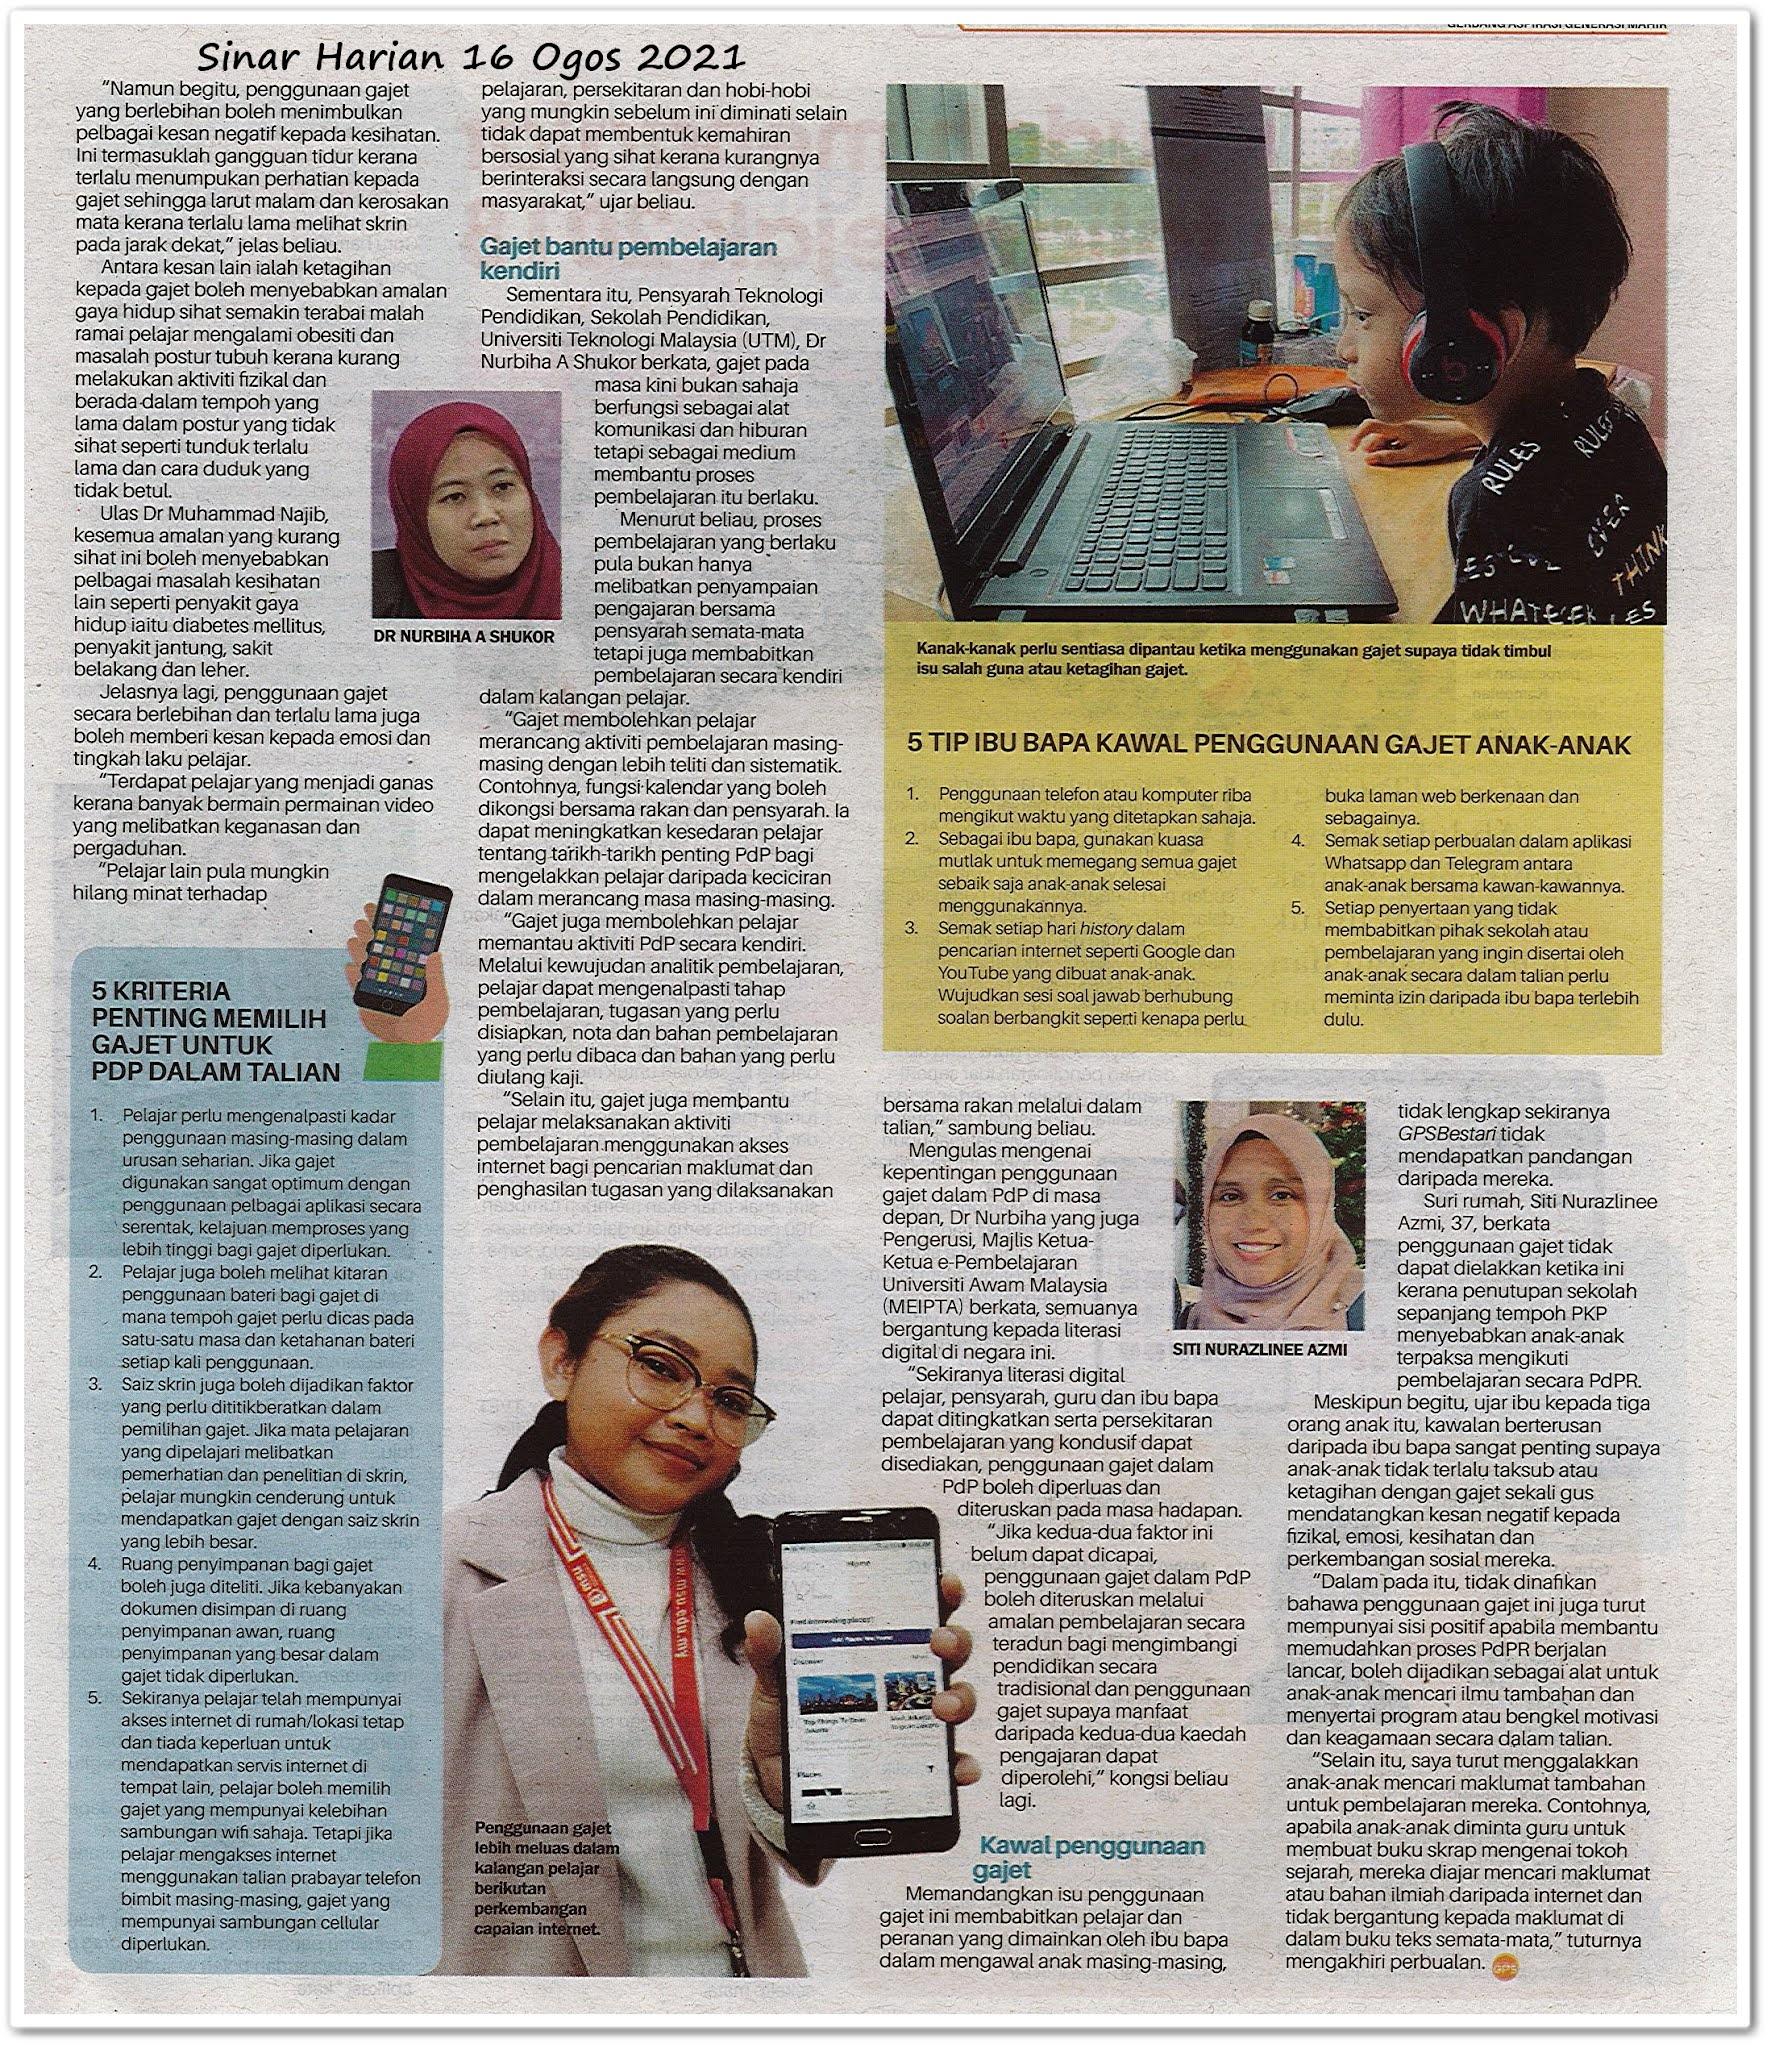 Sisi positif penggunaan gajet - Keratan akhbar Sinar Harian 16 Ogos 2021